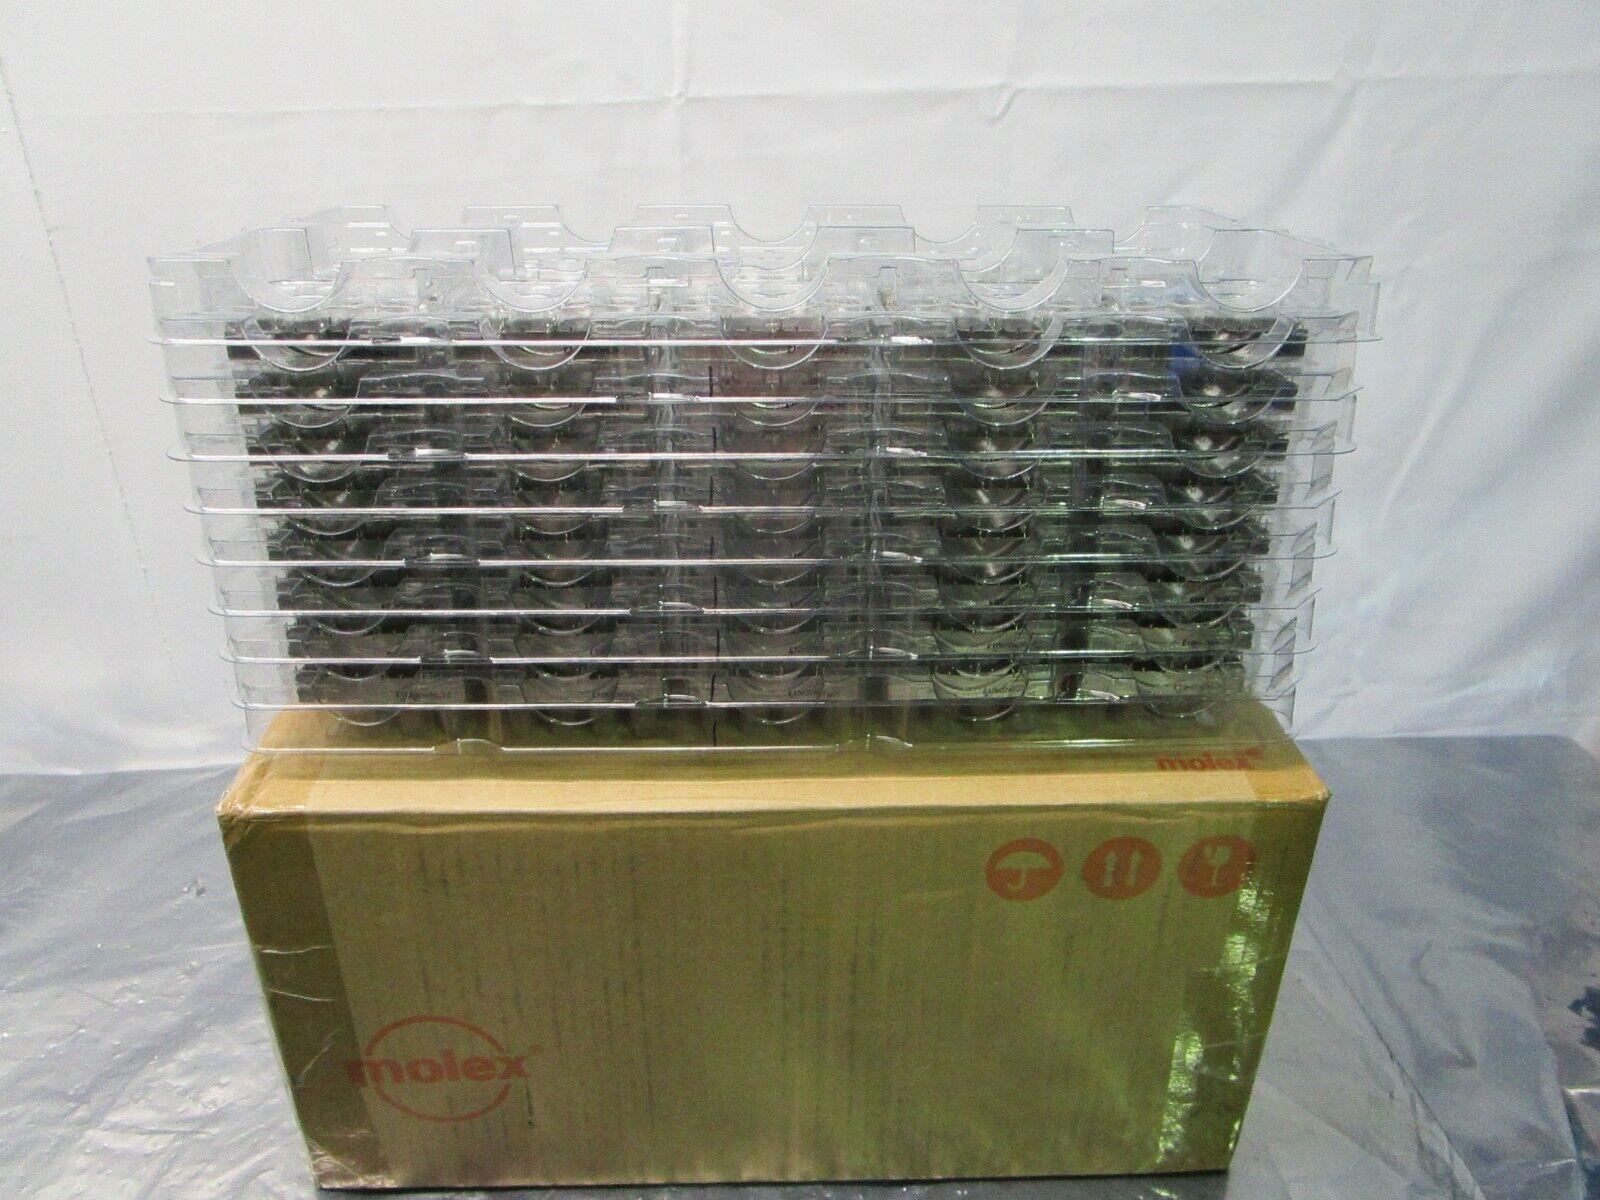 1 Lot of 80 Molex 0747540420 1X4 SFP+ GangedCage forL/P w/PressFit, 102049